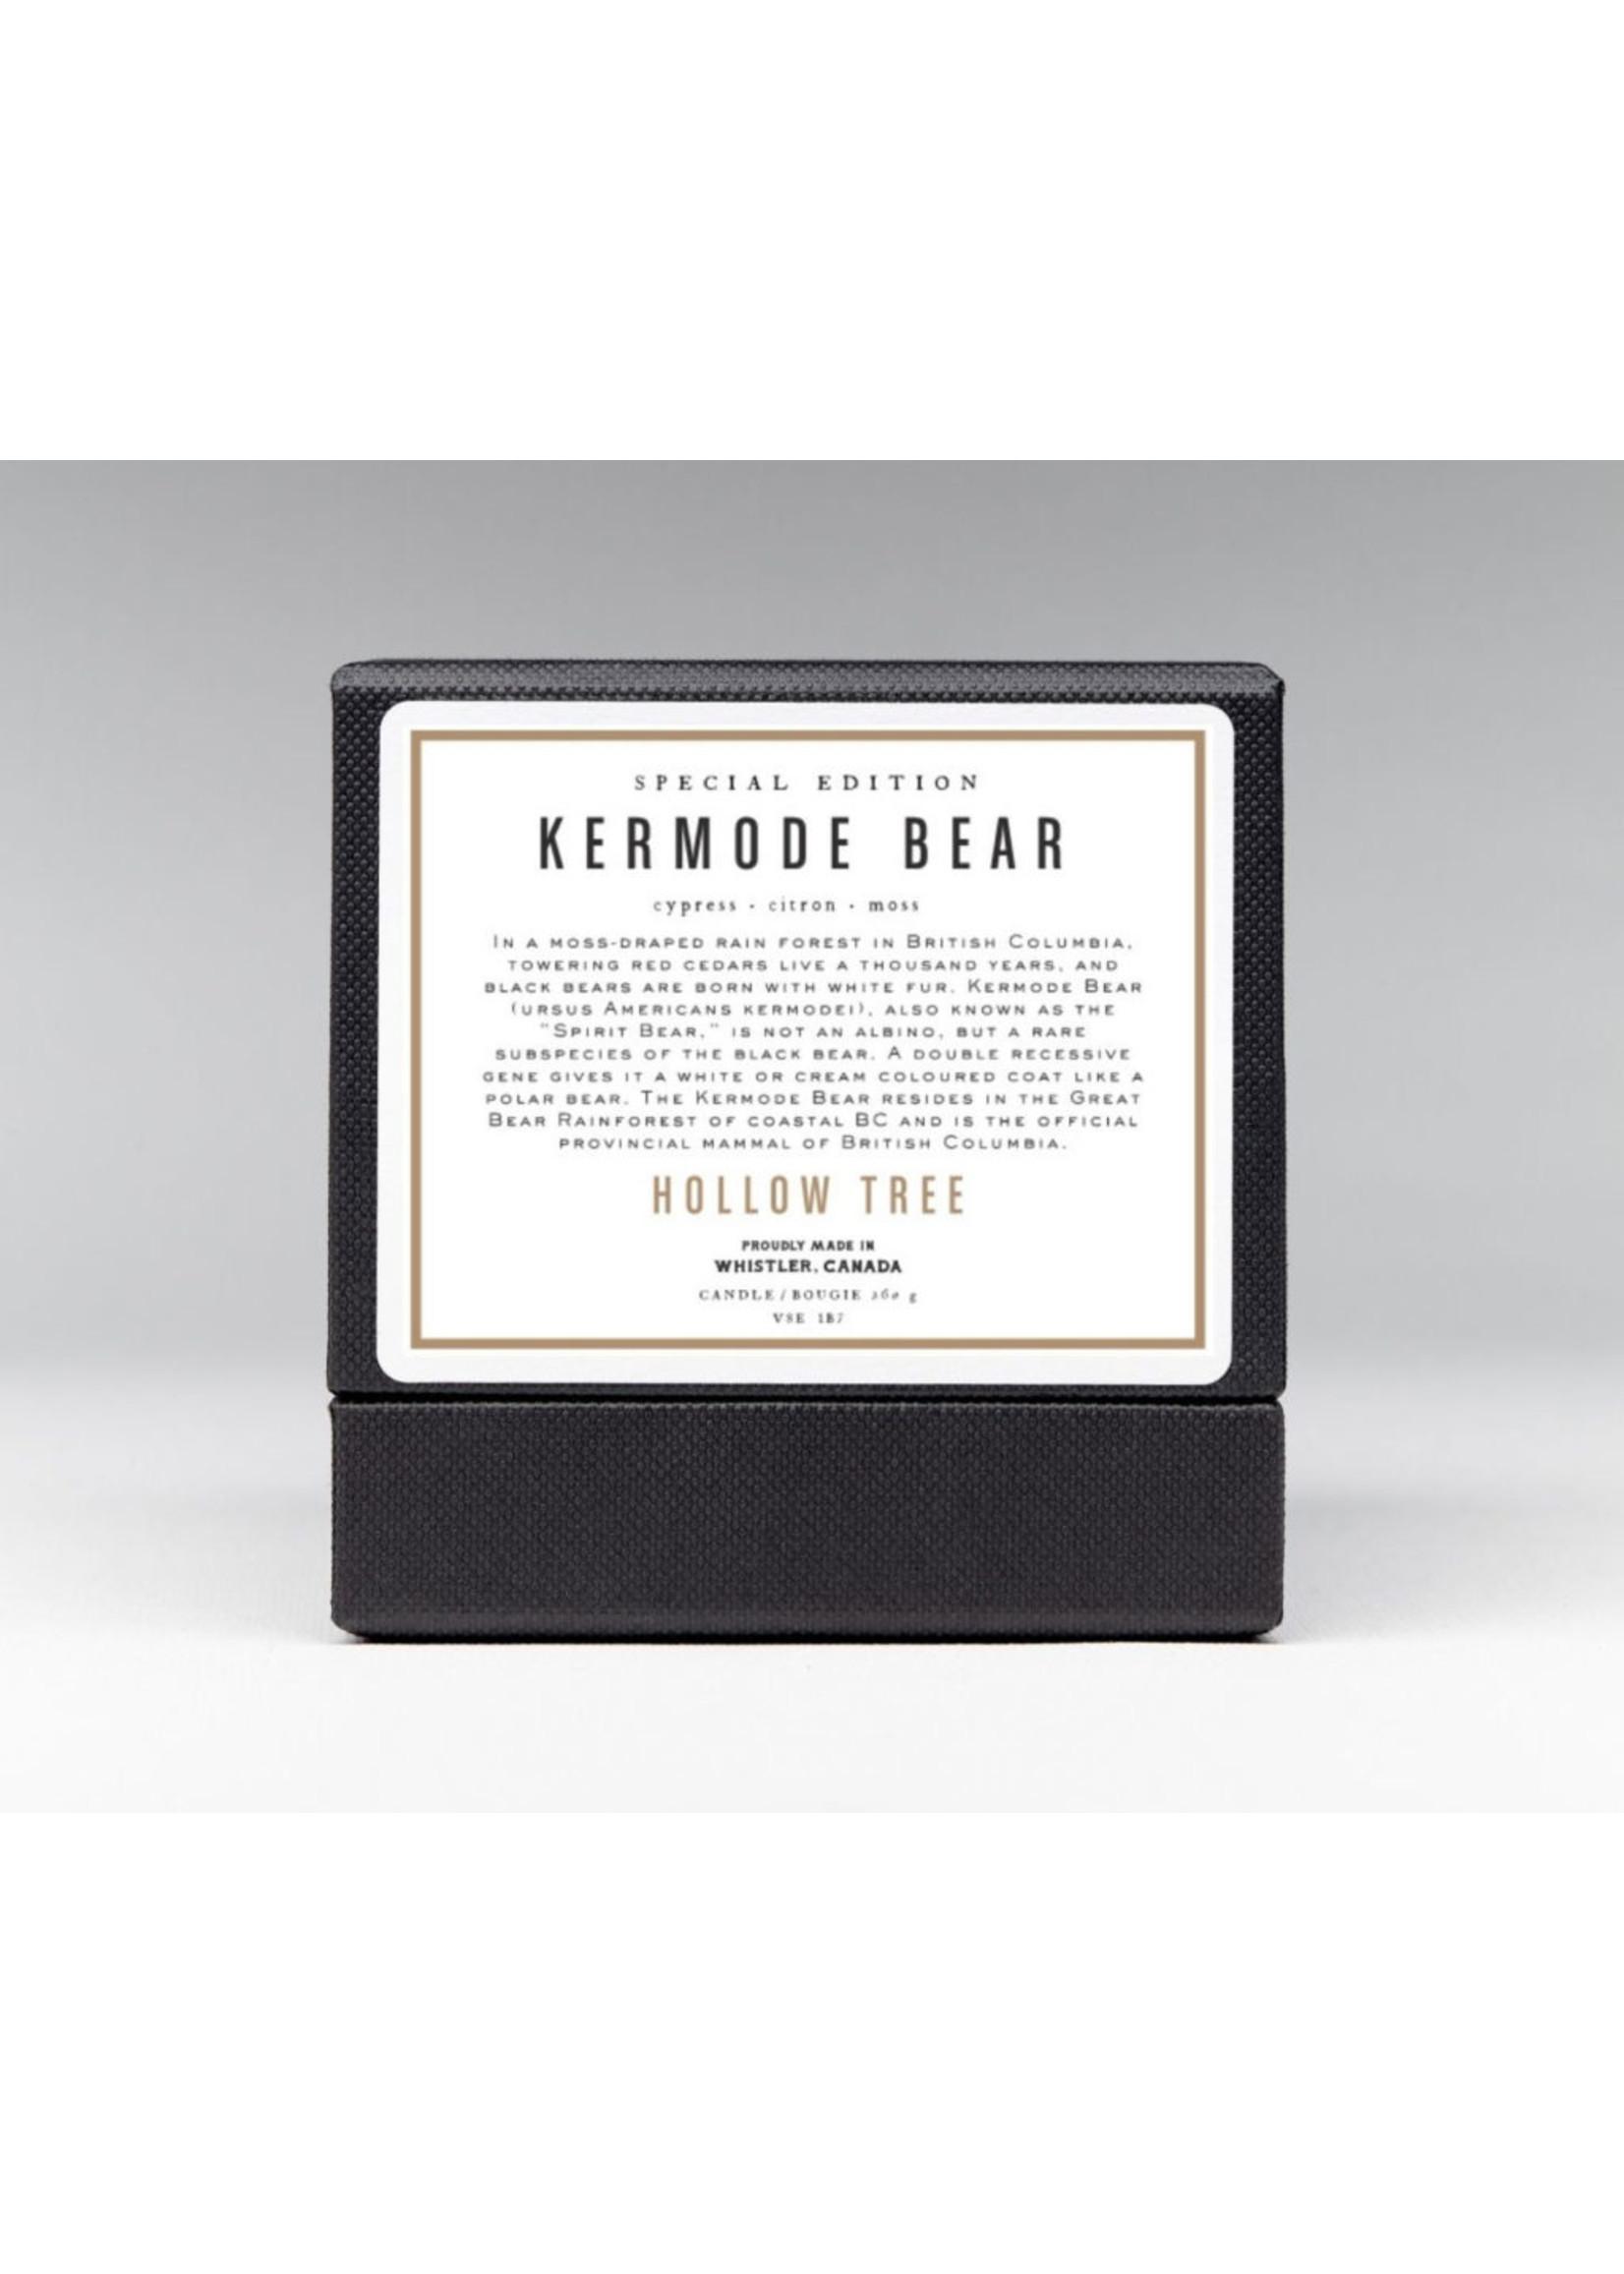 Hollow Tree Kermode Bear Candle